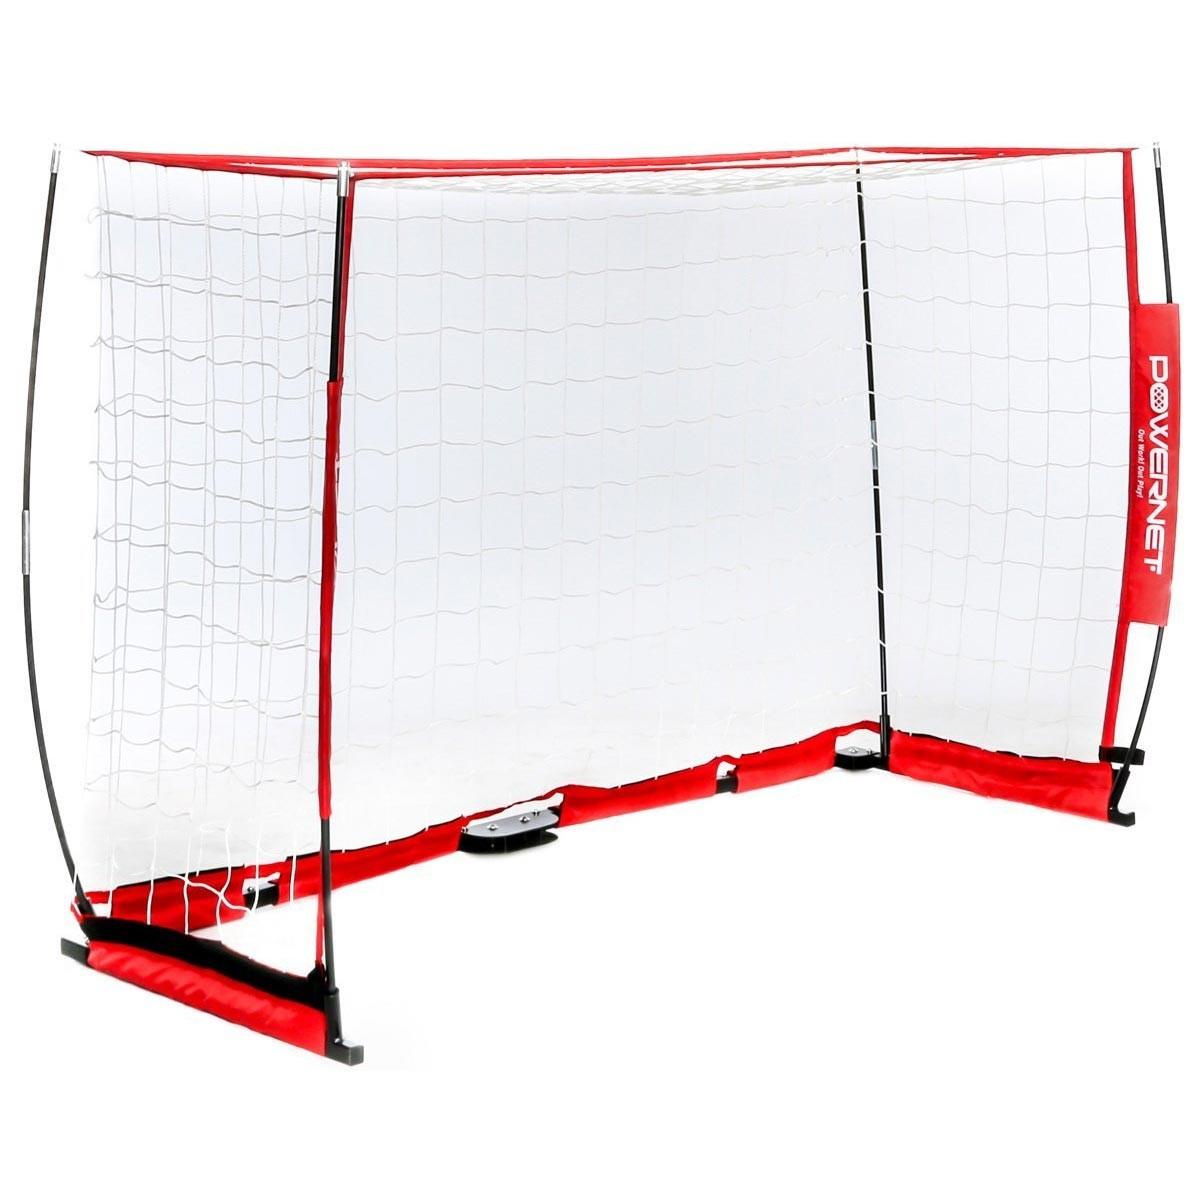 Powernet 2m X 3m Pop Up Futsal Soccer Goal